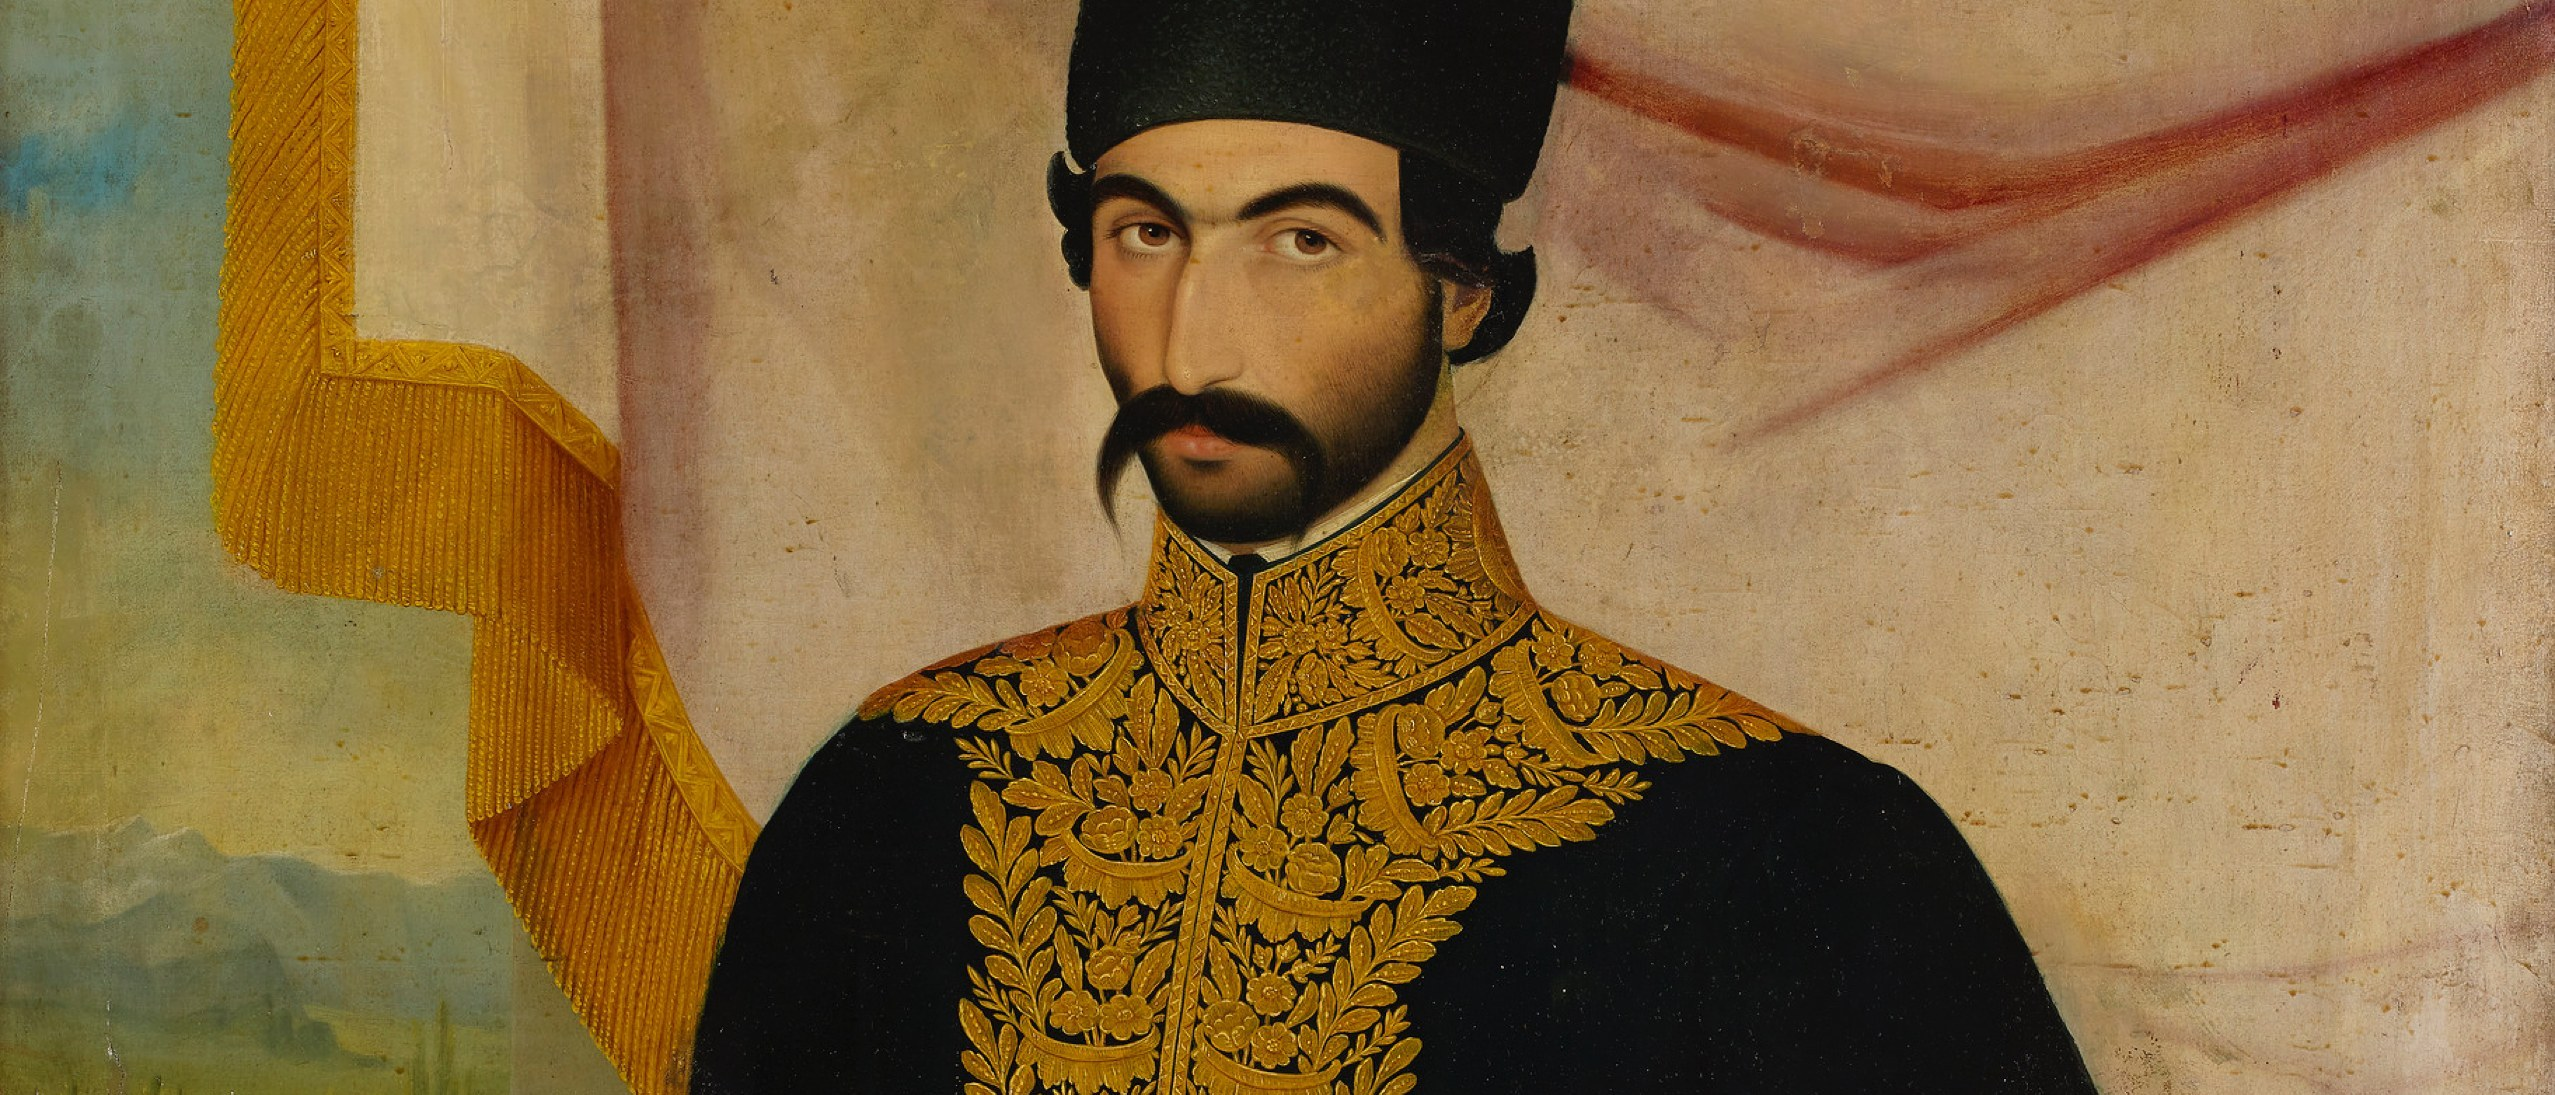 painting of Prince Jalal al-Din